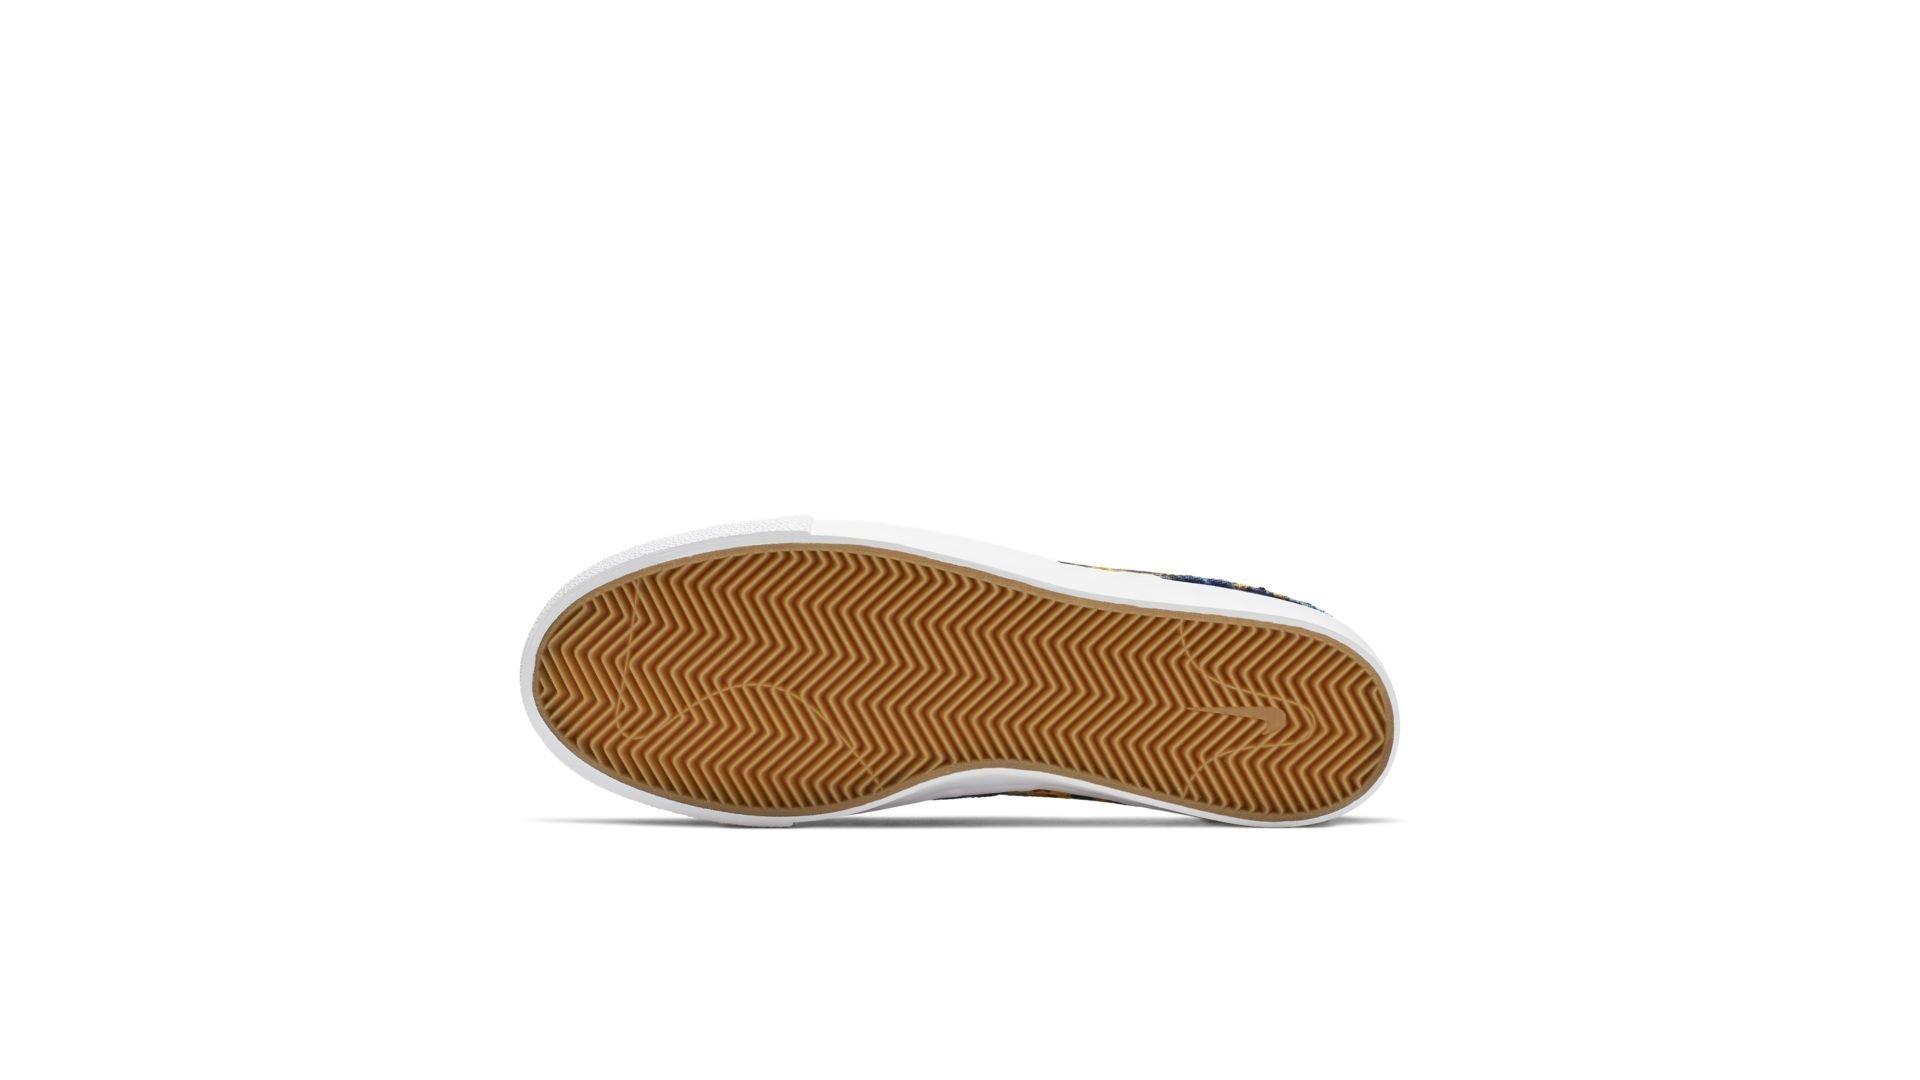 Nike SB Janoski Slip-On Premium (CJ7760-900)